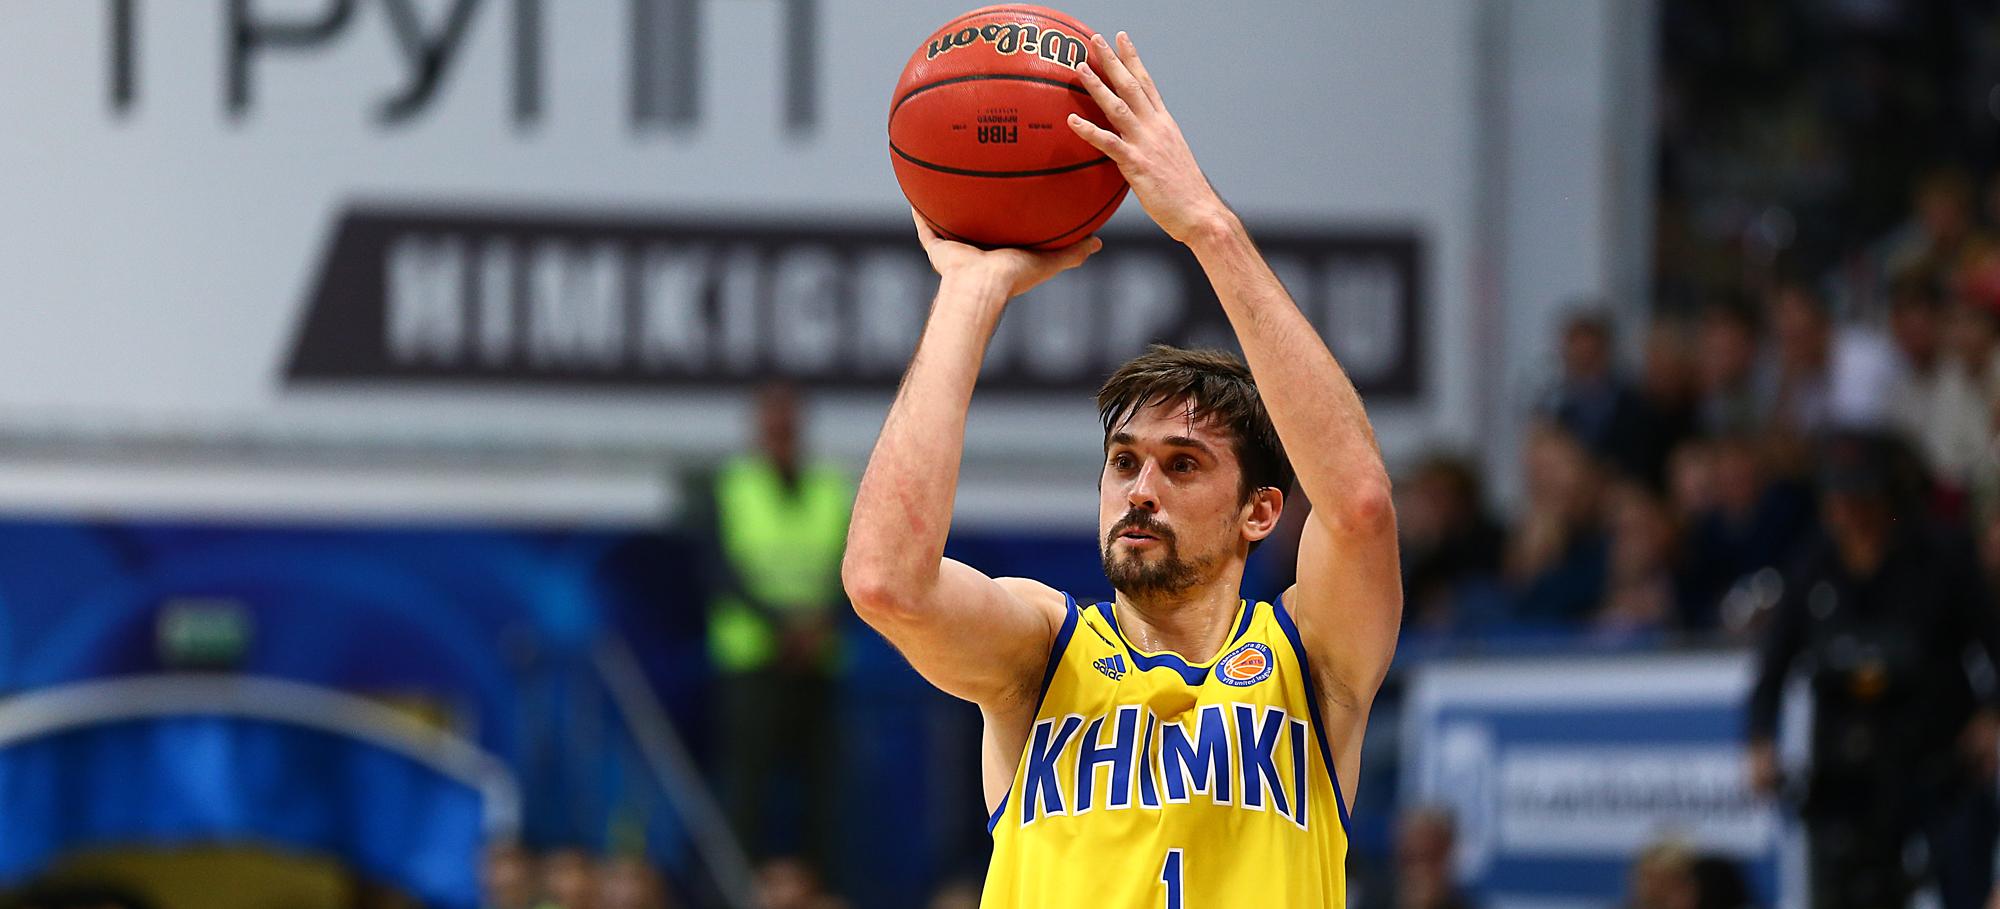 Previa 6a jornada Euroliga - BC Khimki - Bar�a Lassa